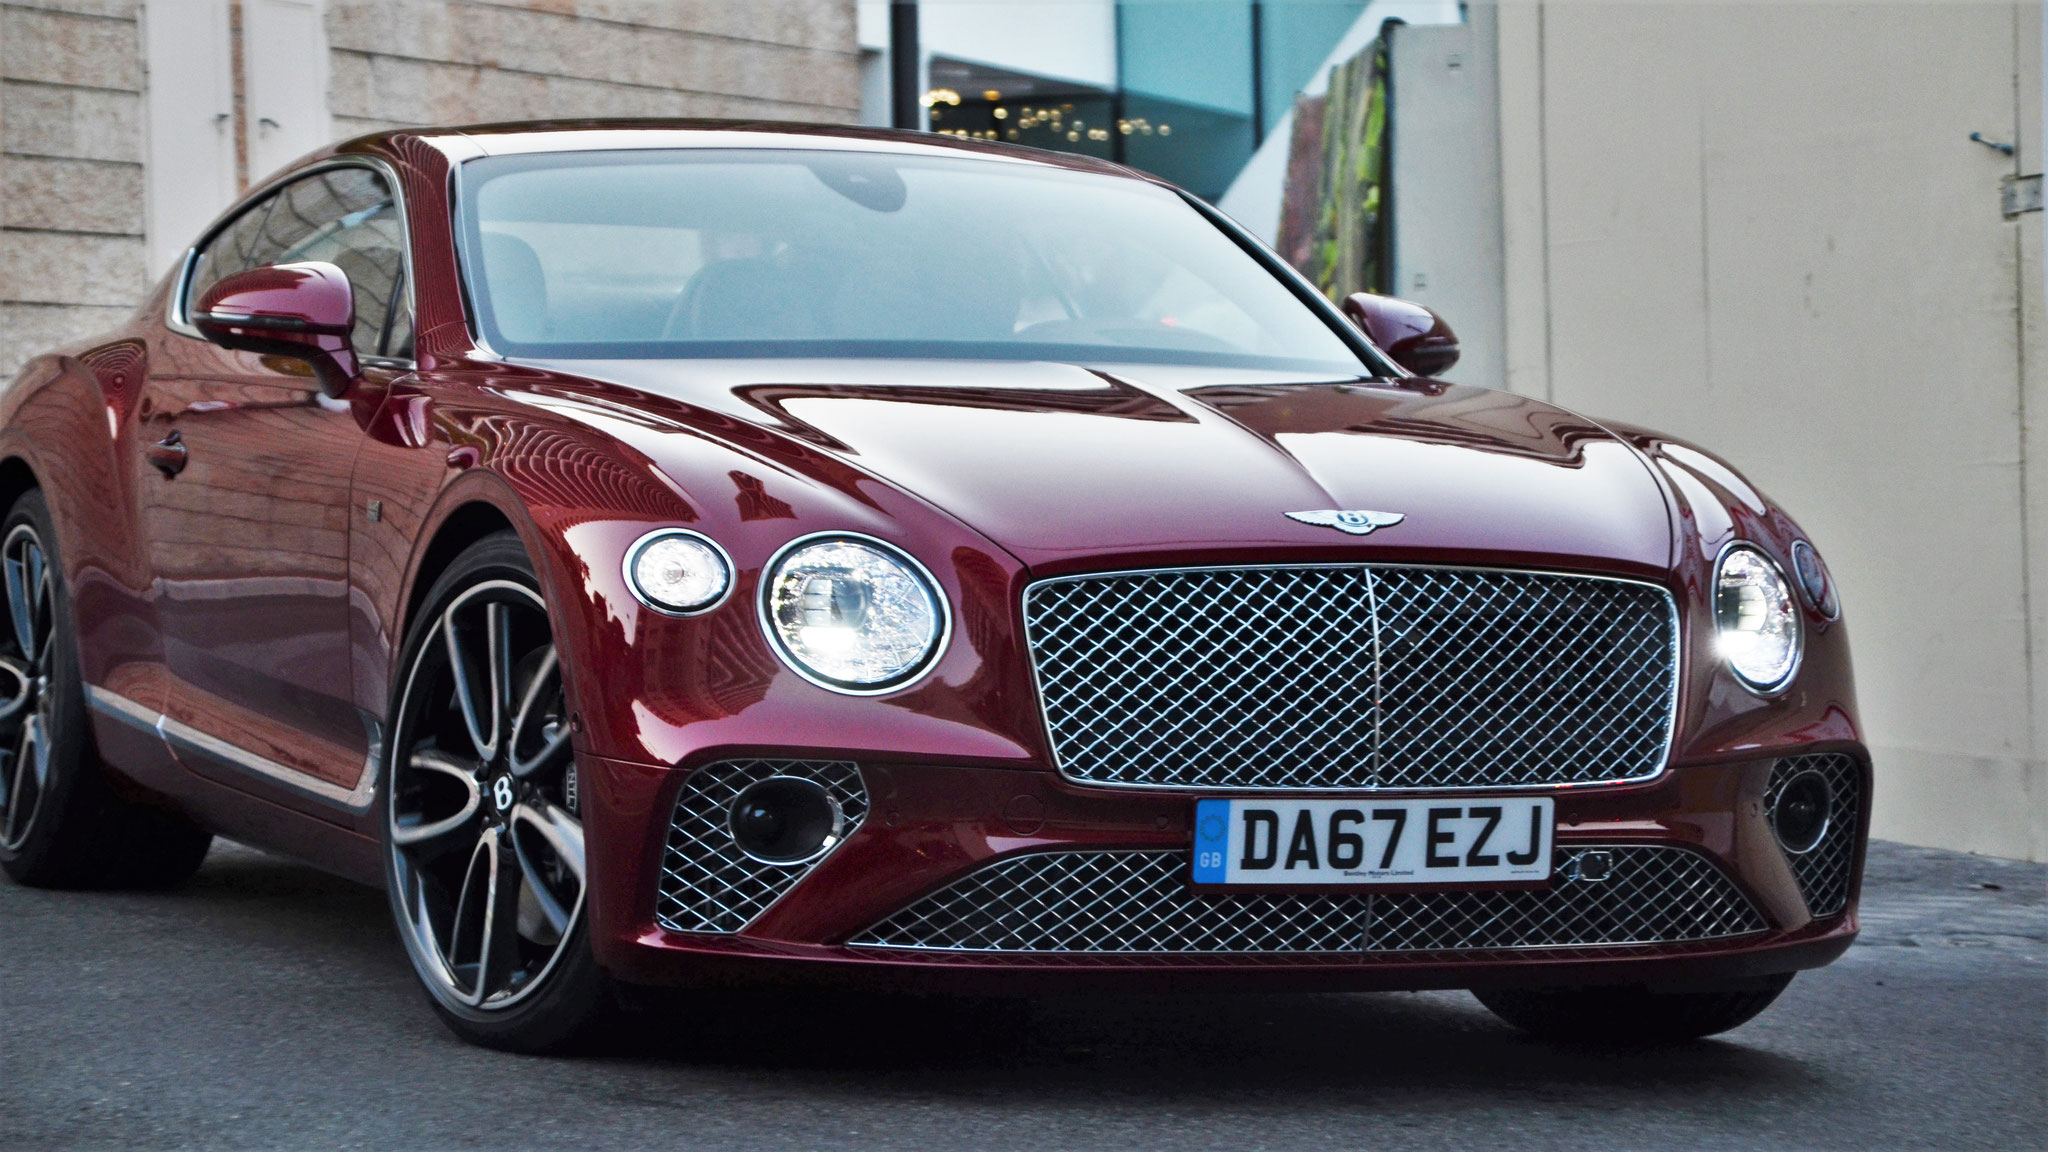 Bentley Continental GT - DA67-EZJ (GB)